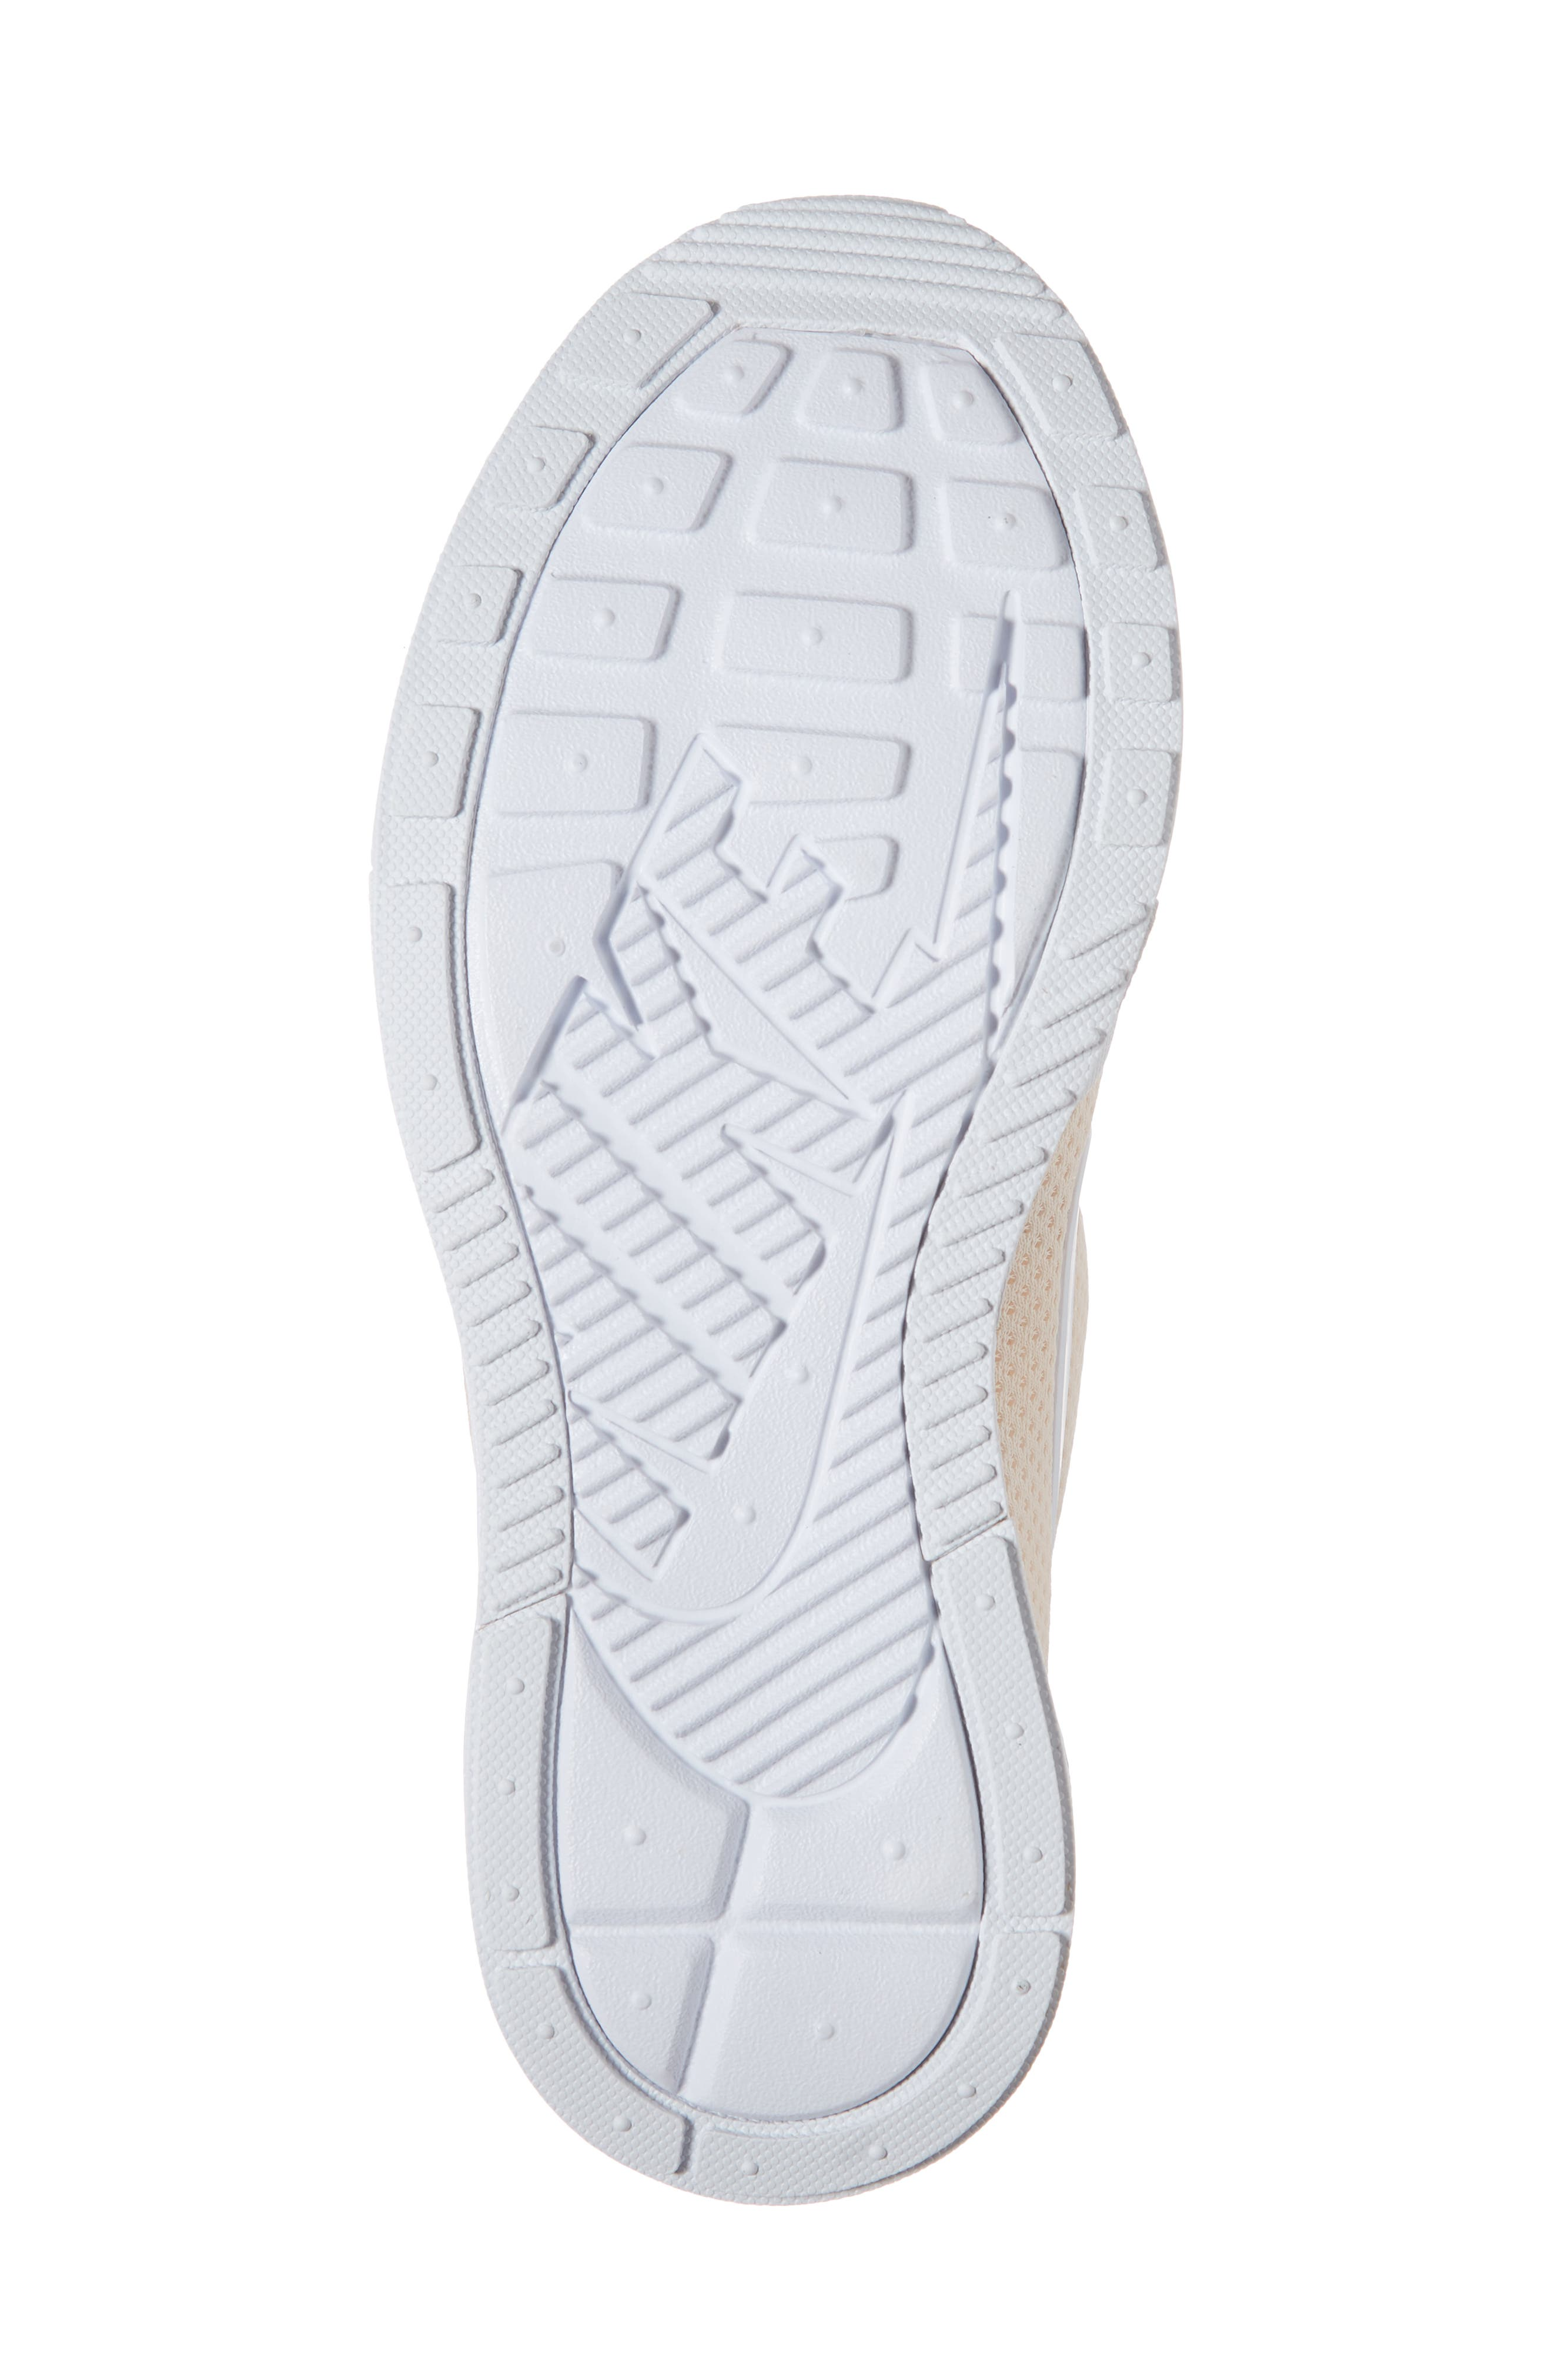 Ashin Modern Shoe,                             Alternate thumbnail 4, color,                             Guava Ice/ White/ White